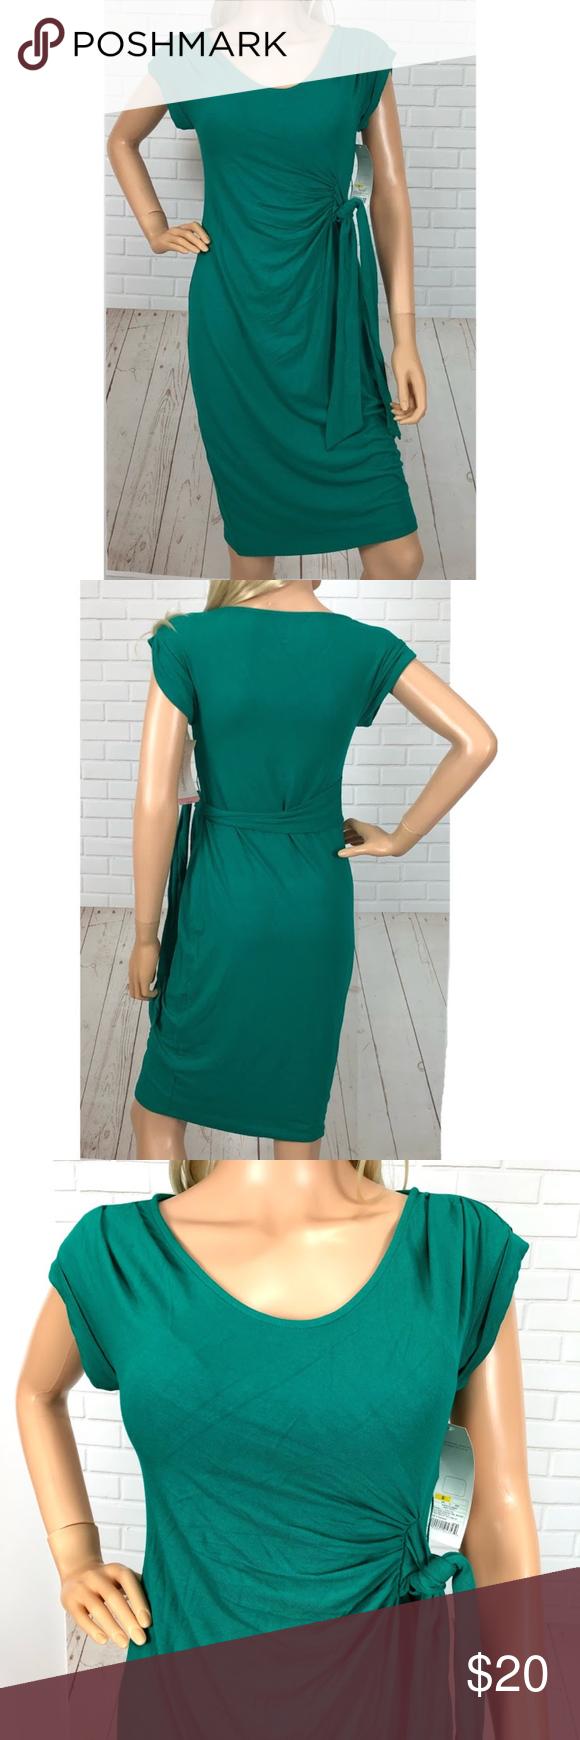 Liz Lange Maternity Green Cap Sleeve Dress S Liz Lange Capped Sleeve Dress Dresses [ 1740 x 580 Pixel ]